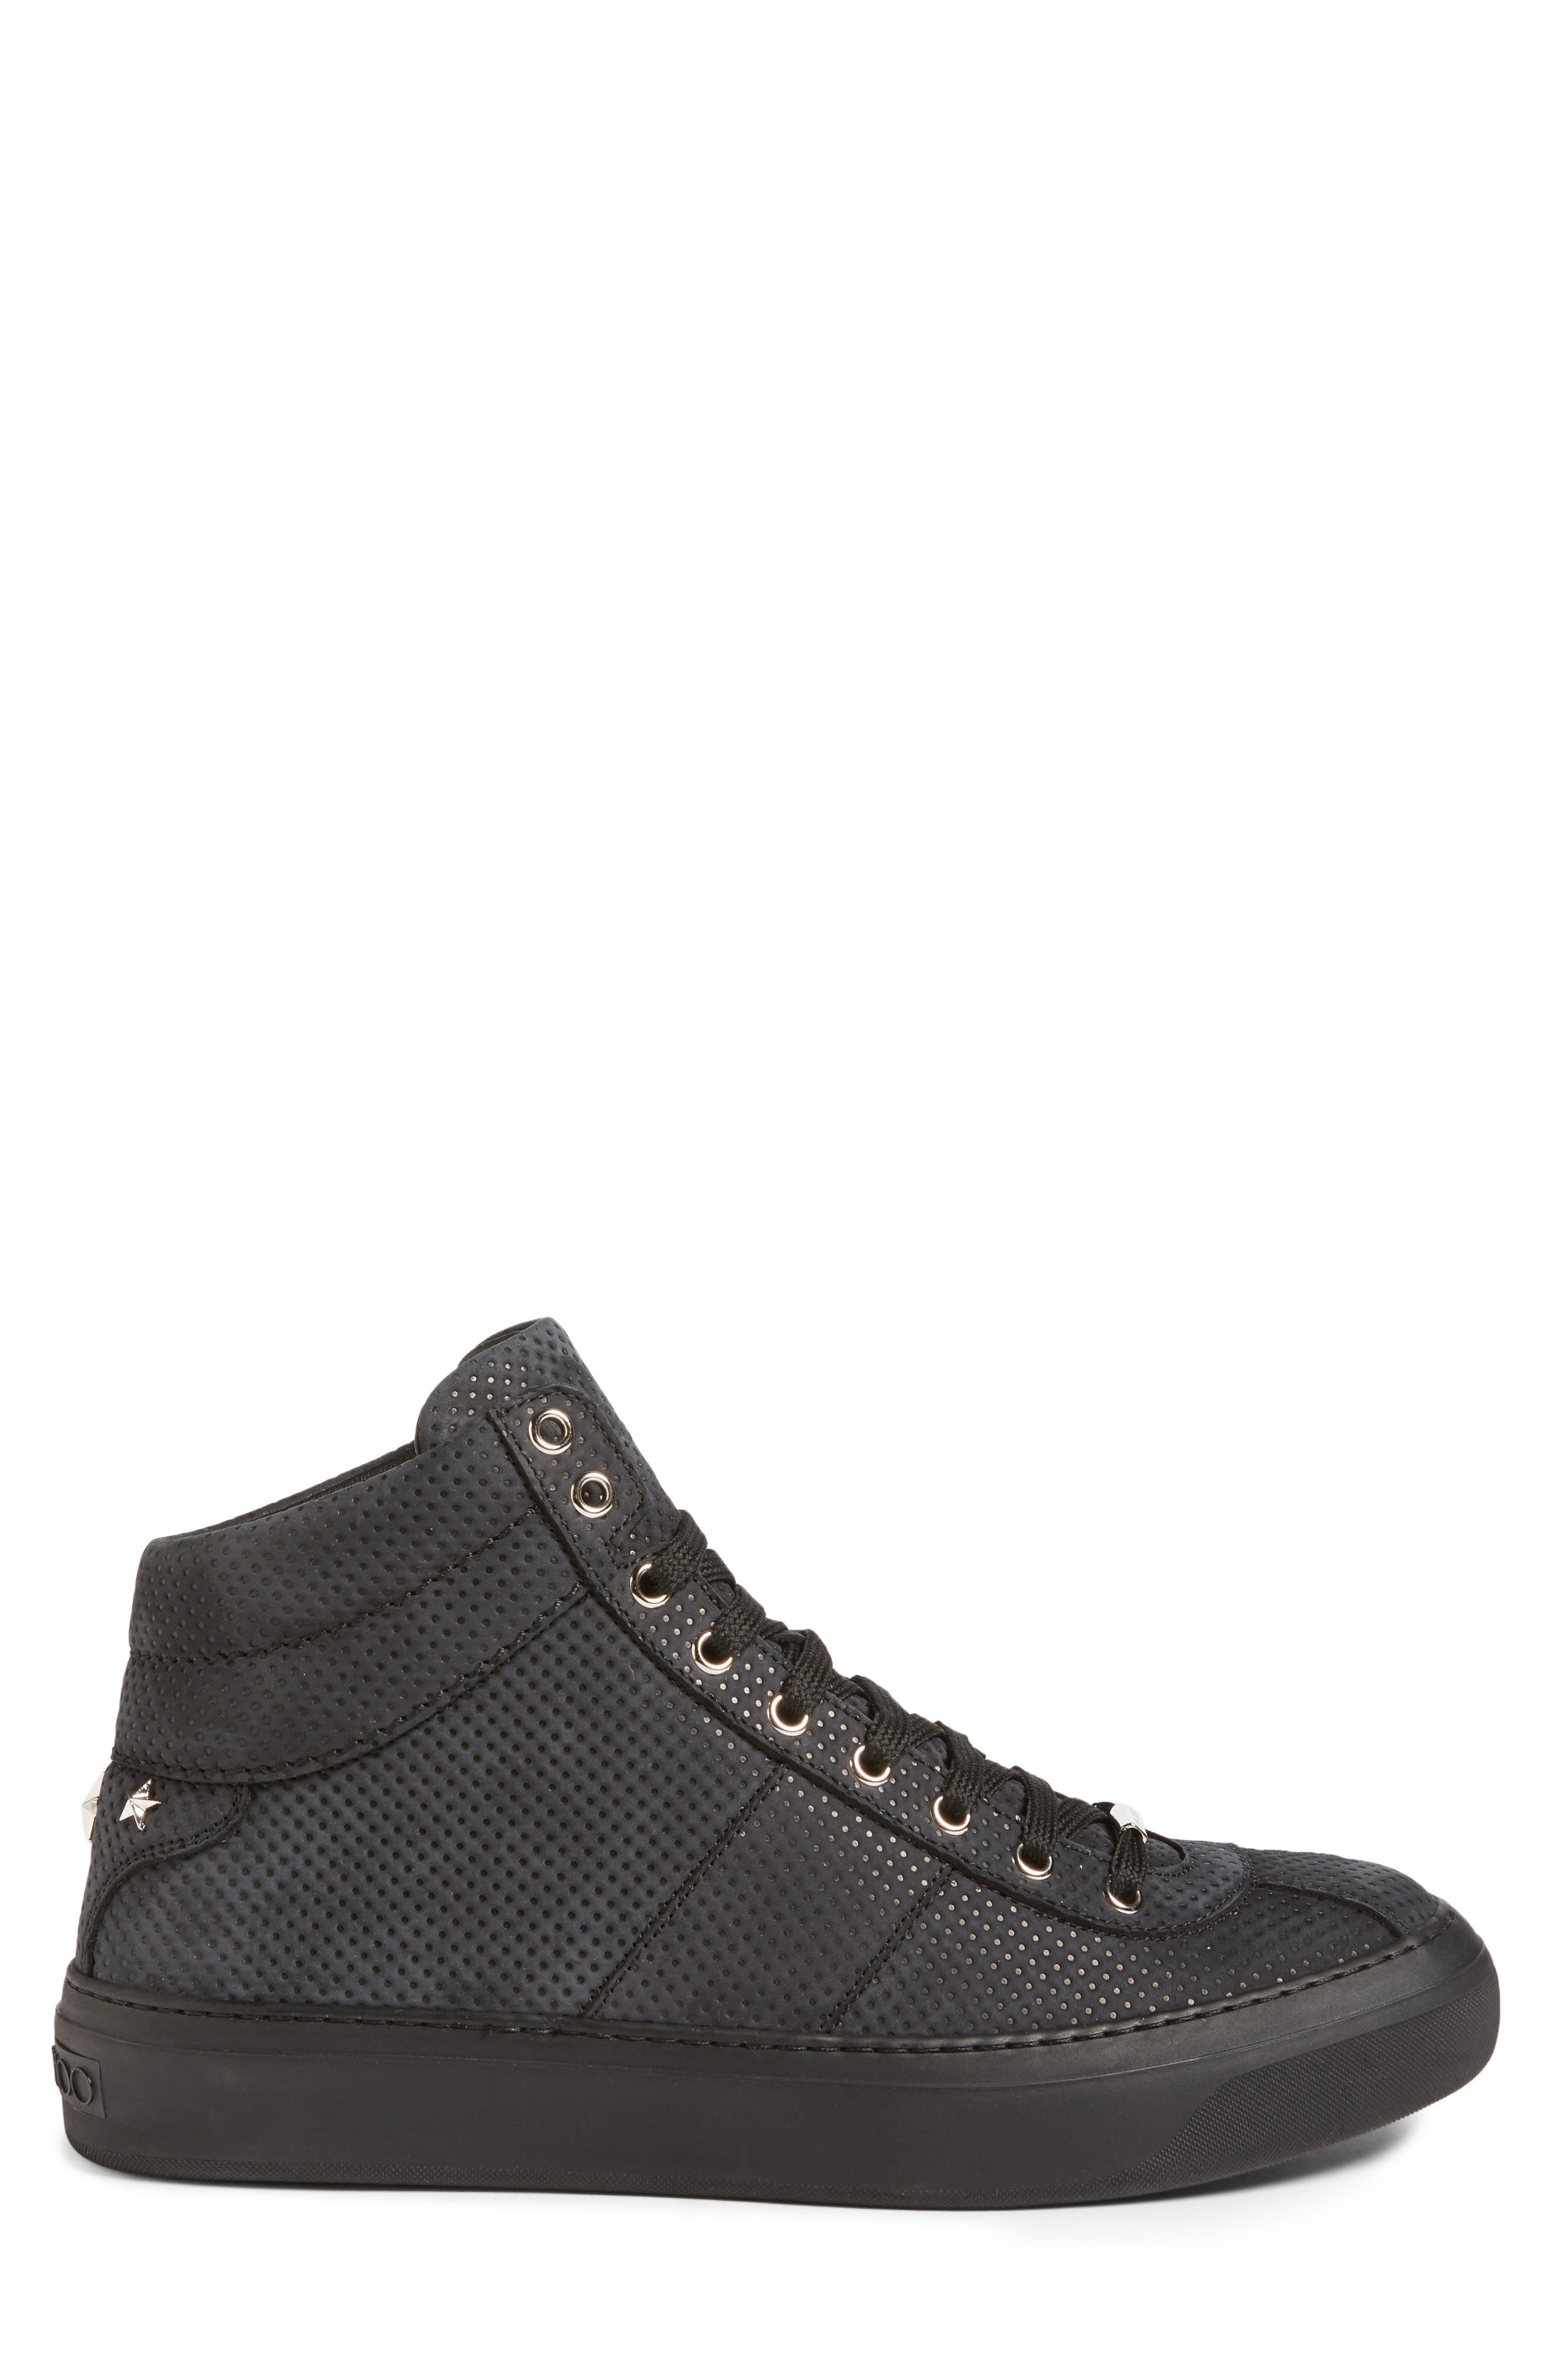 Belgravi Sneaker,                             Alternate thumbnail 3, color,                             001